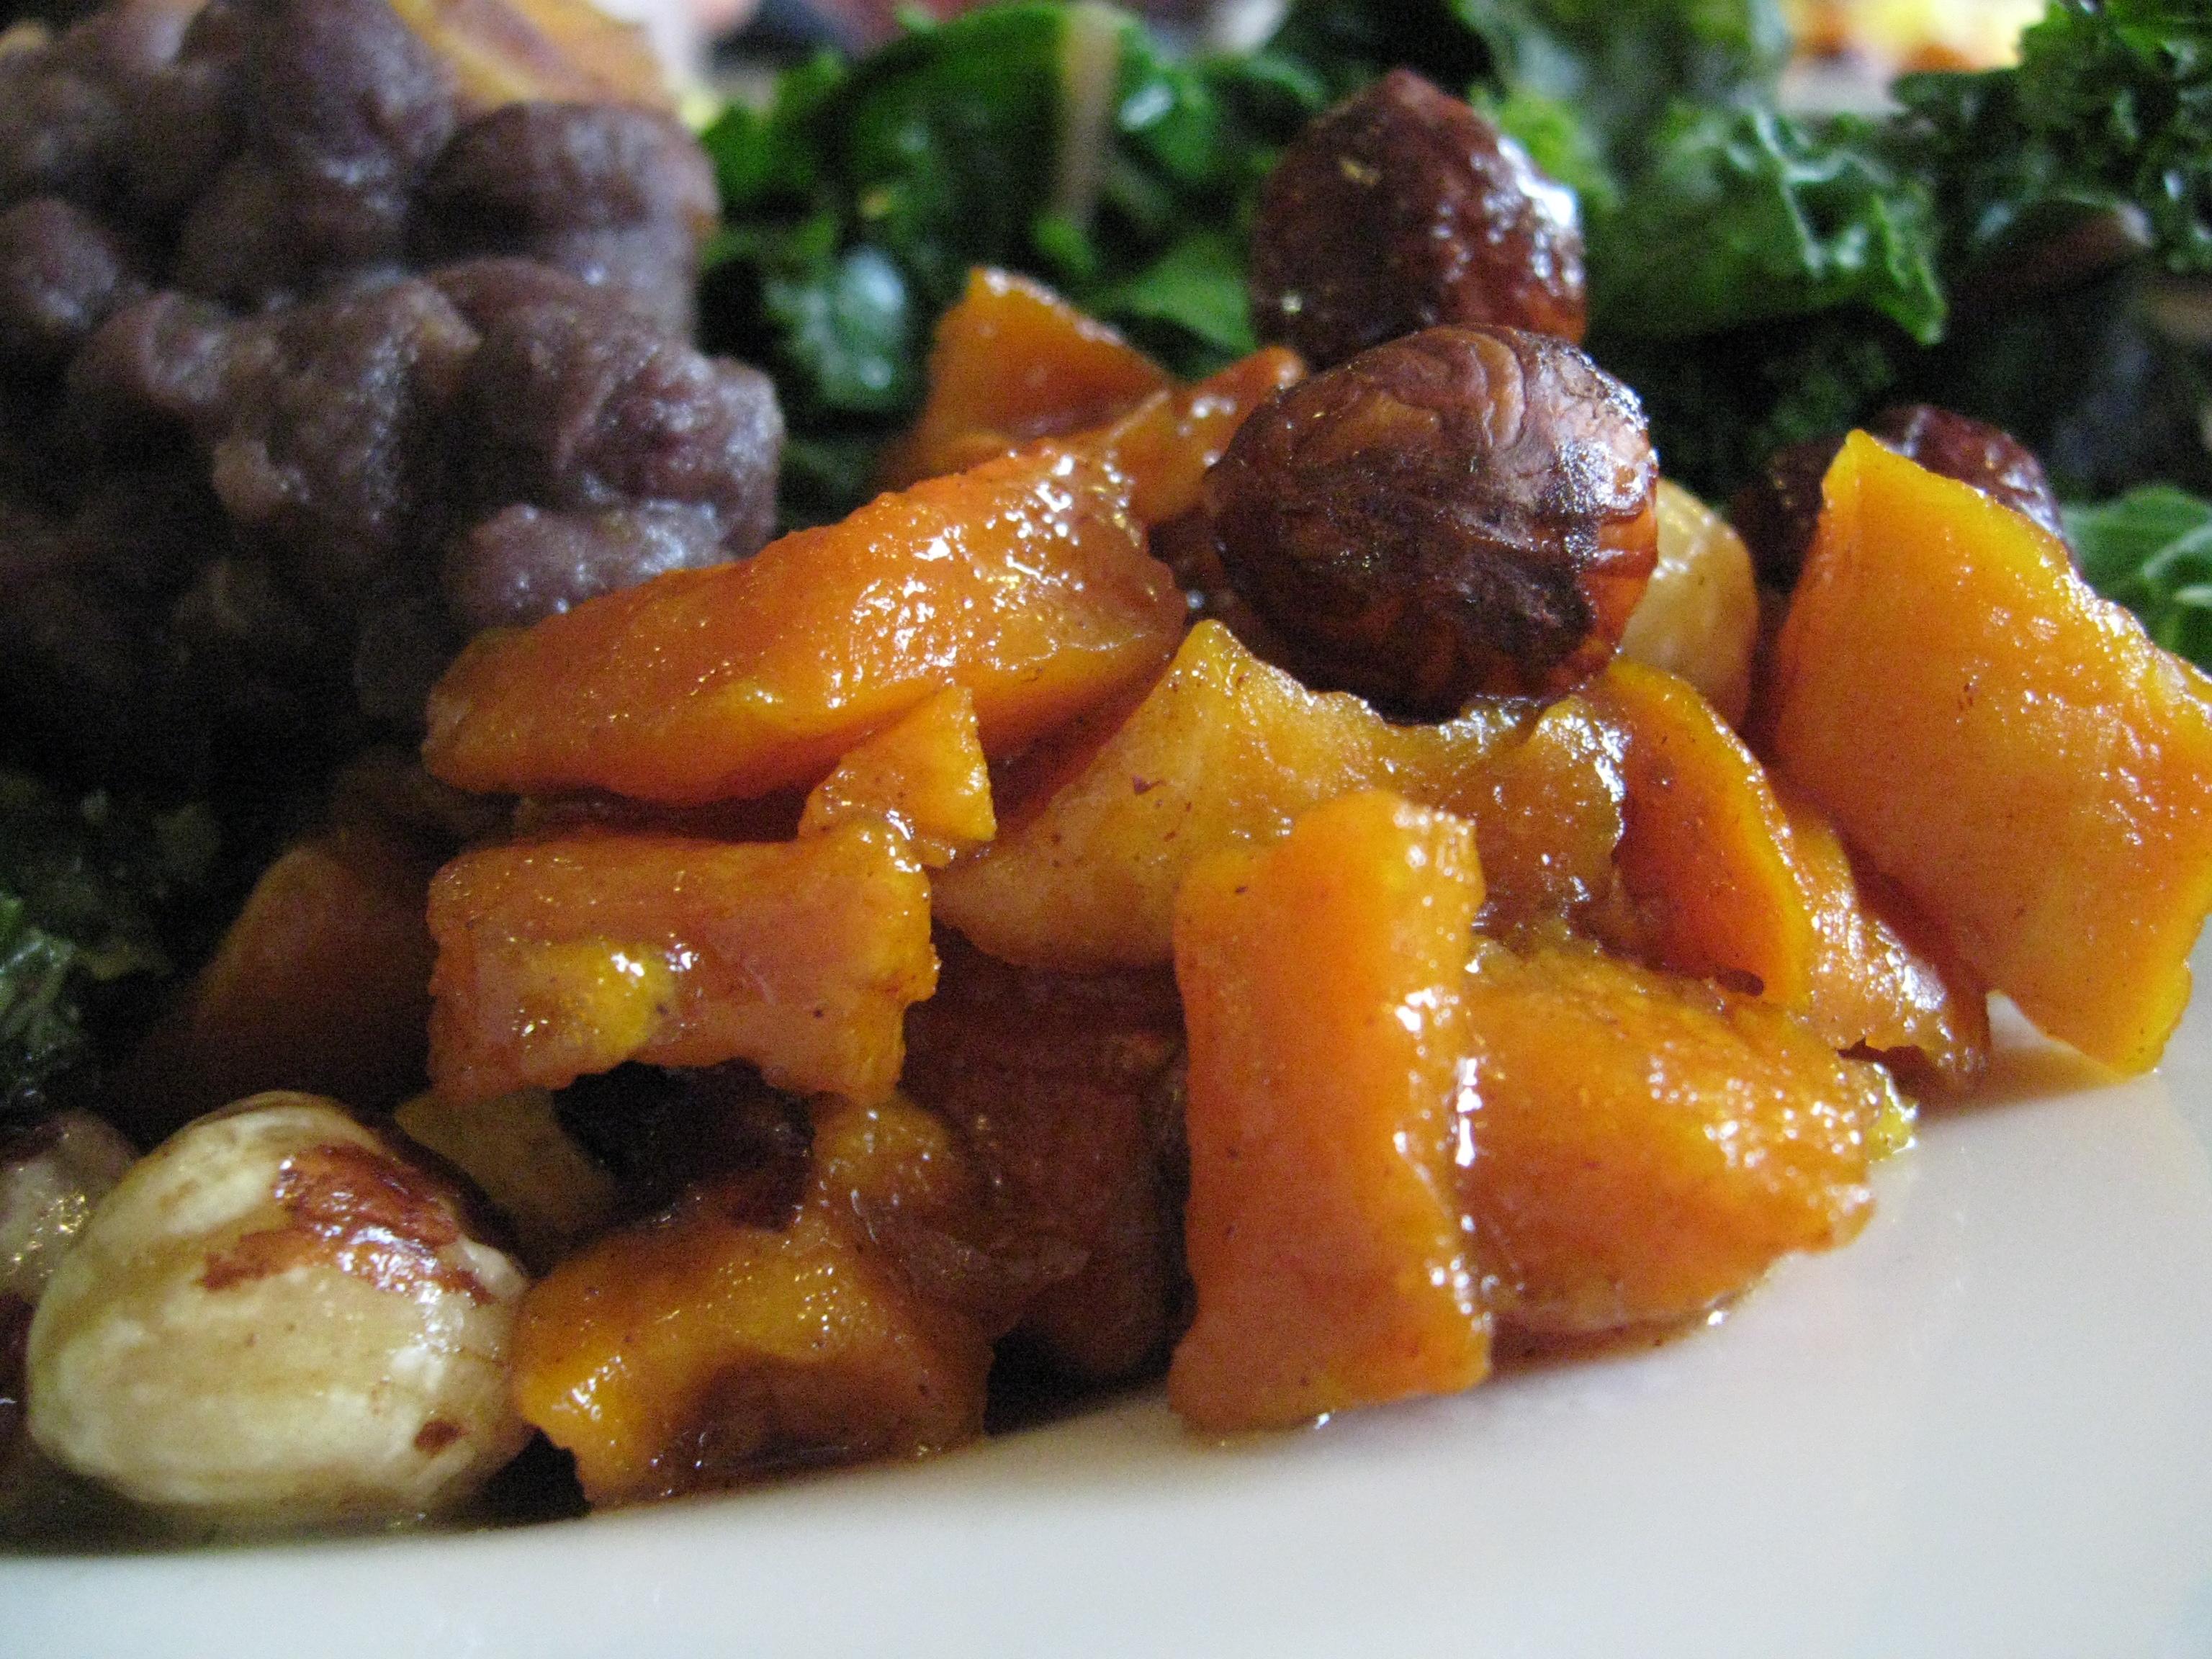 Sweet potato and hazelnuts, black beans, greens: a small window into the cornucopia of food at Kripalu.